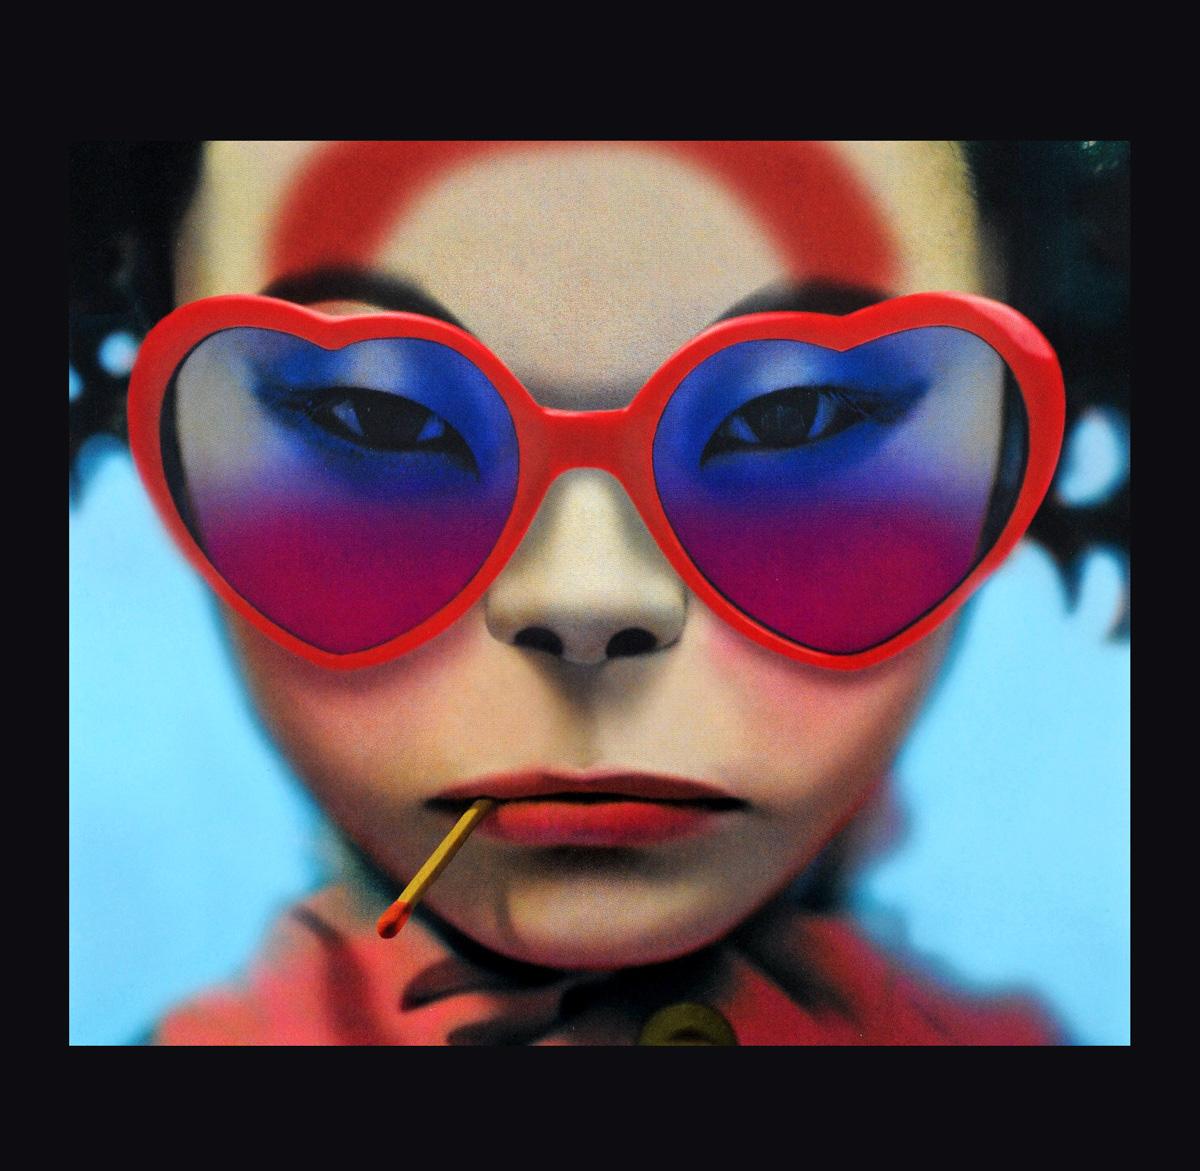 Gorillaz,Vince Staples,Певен Эверетт,Popcaan,De La Soul,Грейс Джонс,Энтони Хэмилтон,Мэвис Стейплз,Jamie Principle,Benjamin Clementine Gorillaz. Humanz. Deluxe Edition (2 LP) gorillaz – humanz cd